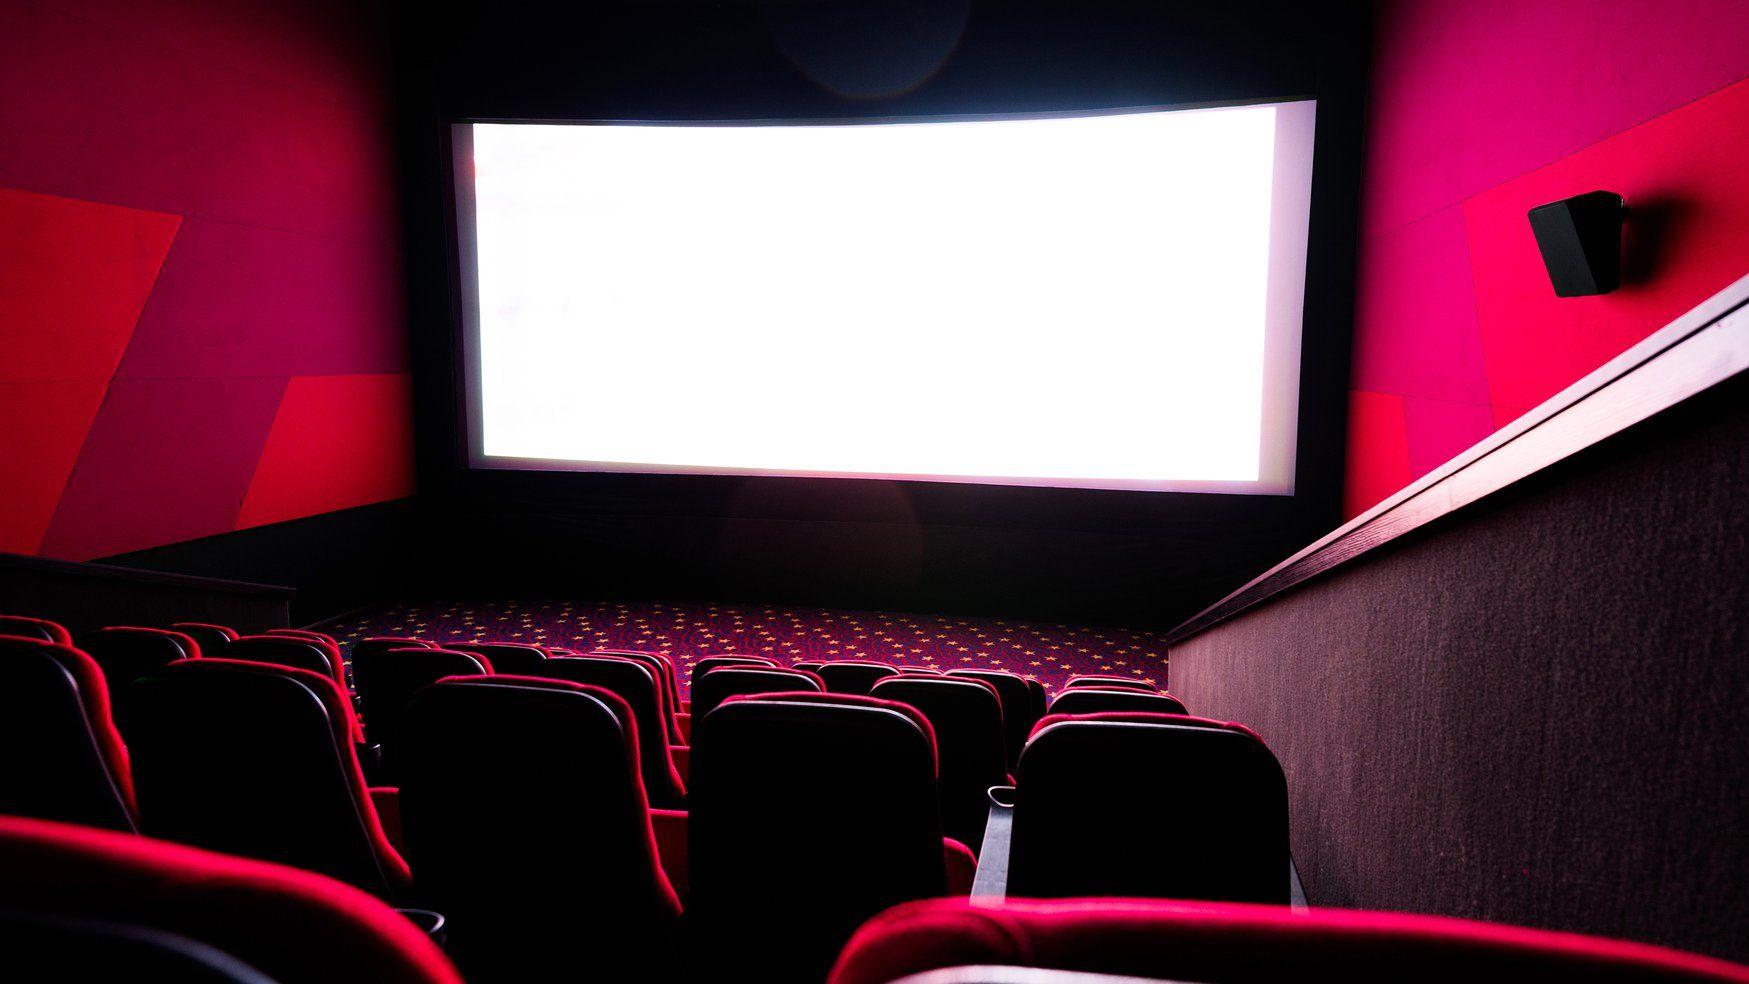 Werbespendings: Kinowerbung geht global durch die Decke - dank China